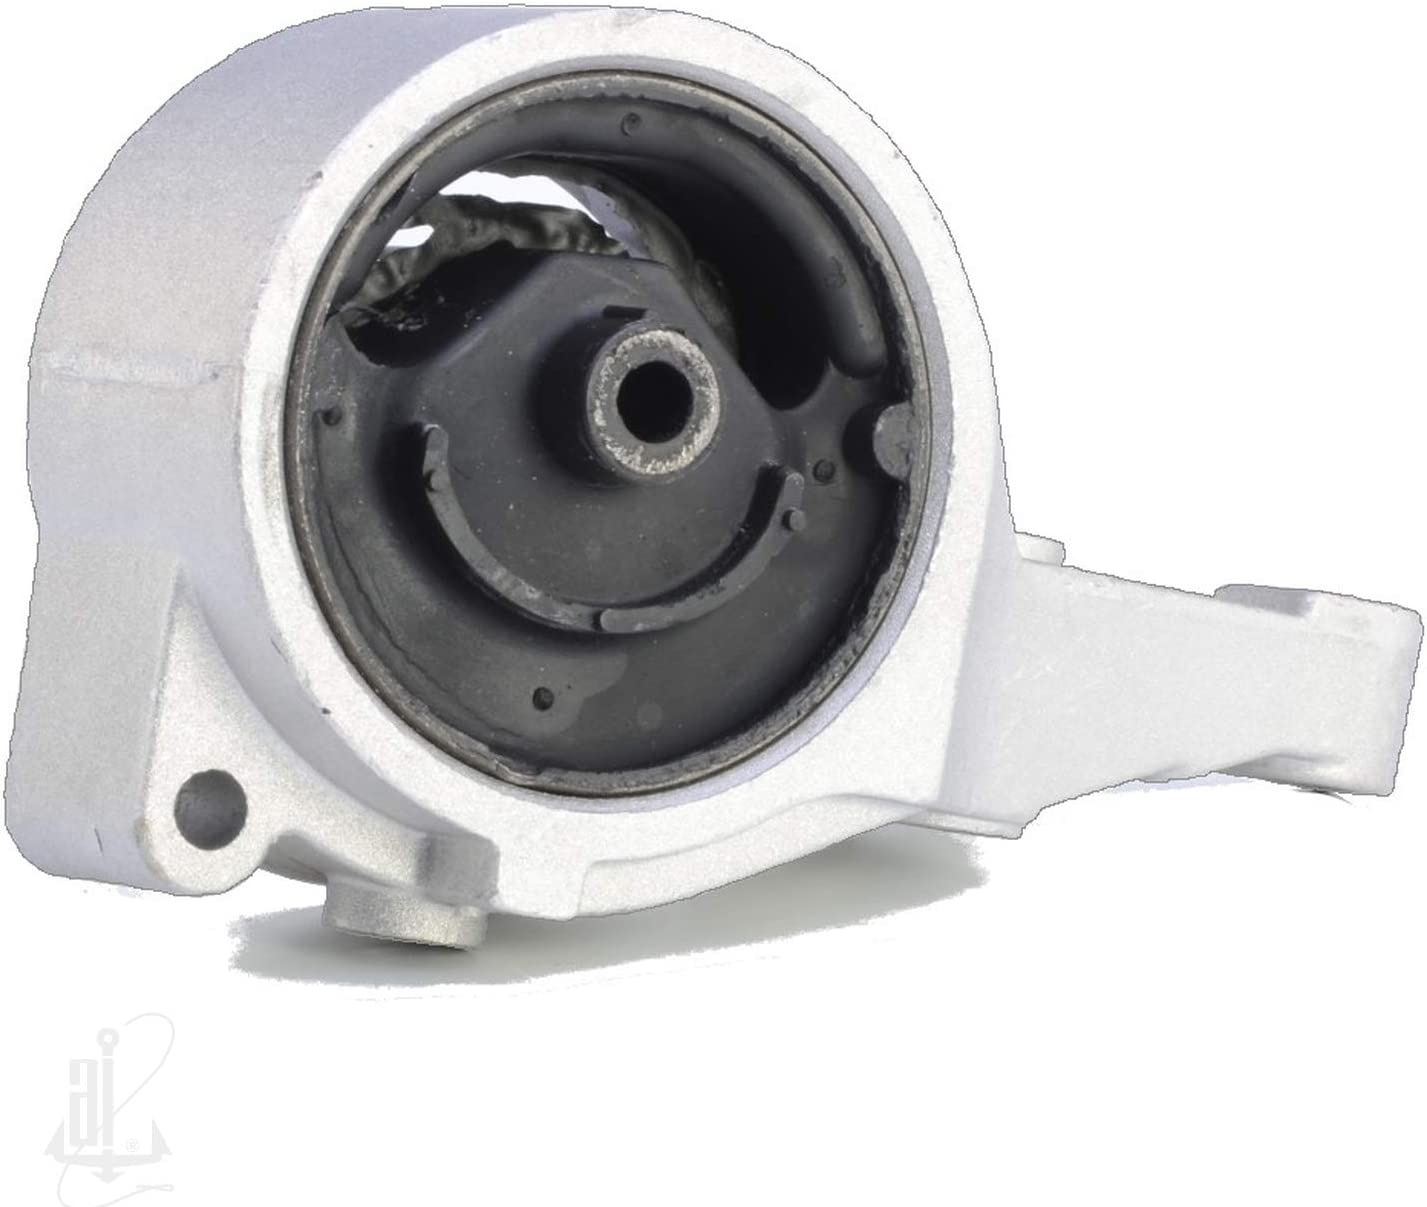 Anchor 9660 Engine Mount